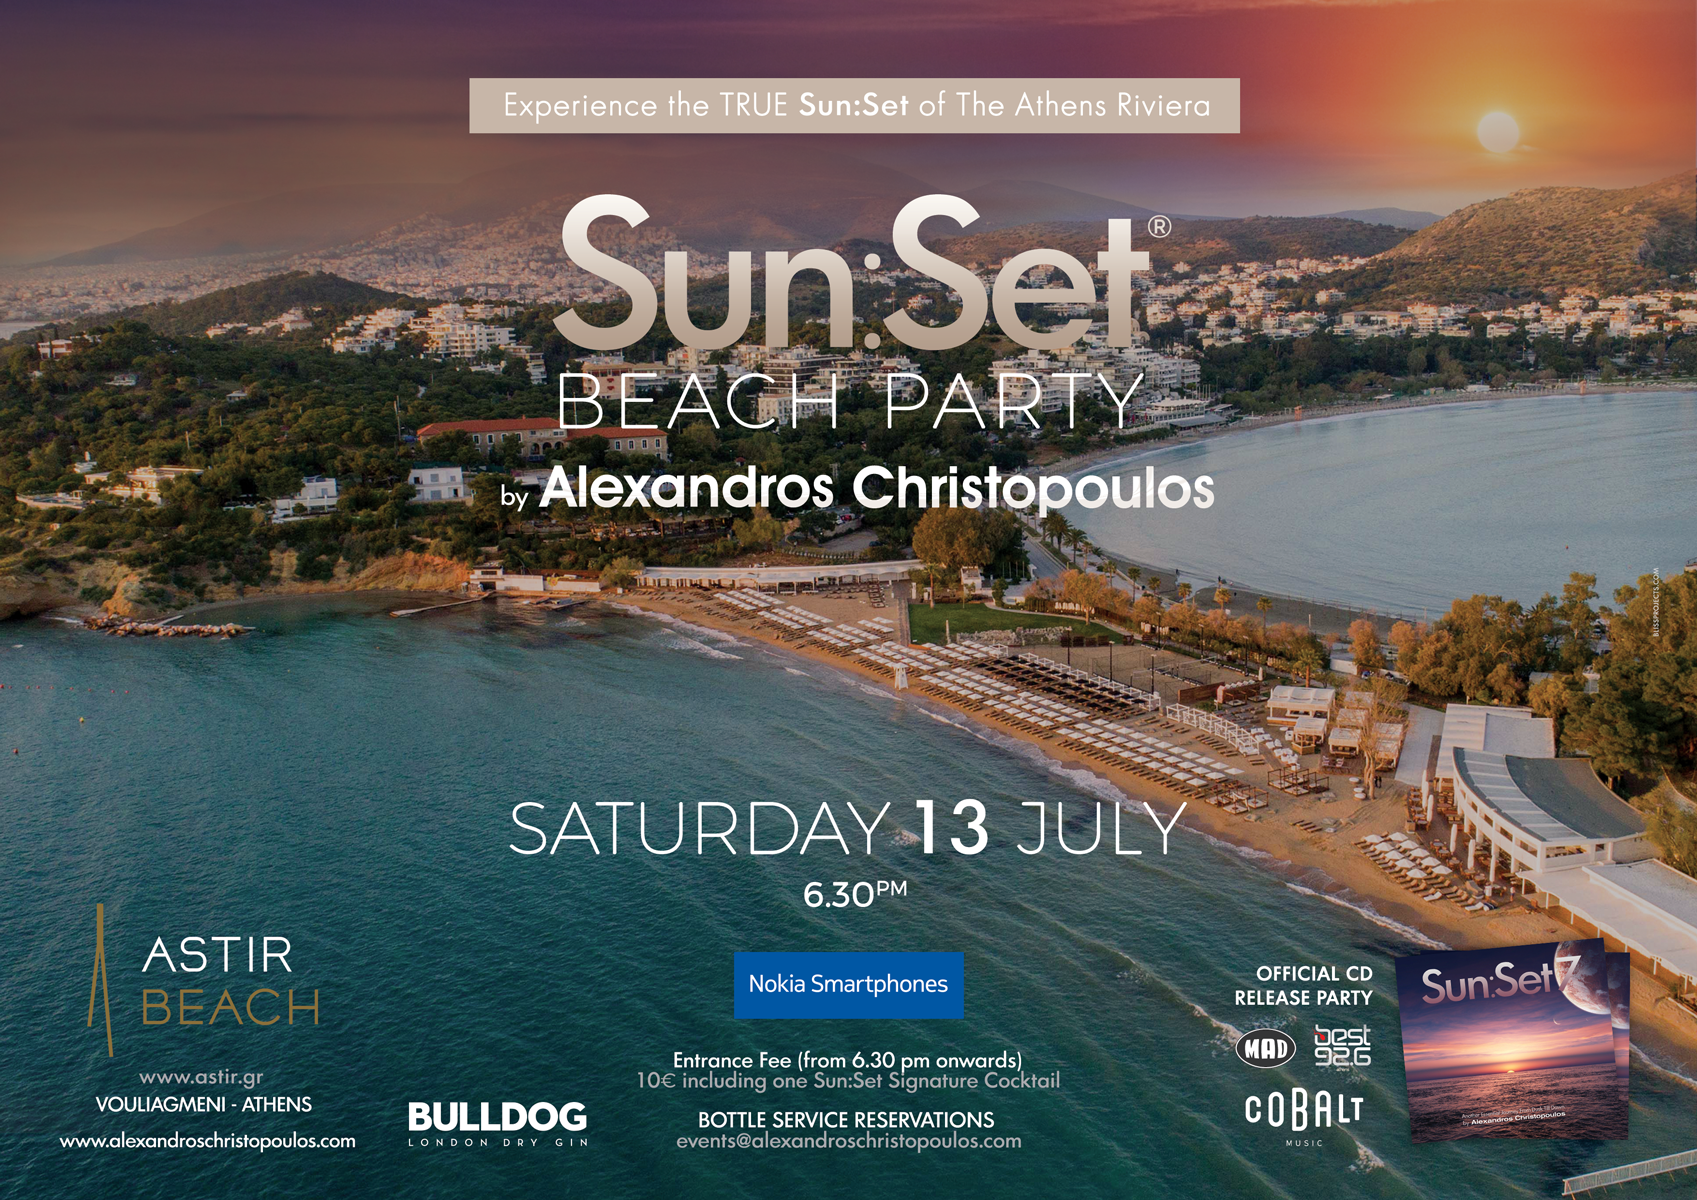 Sun:Set ® Beach Party | ASTIR BEACH (Athens)